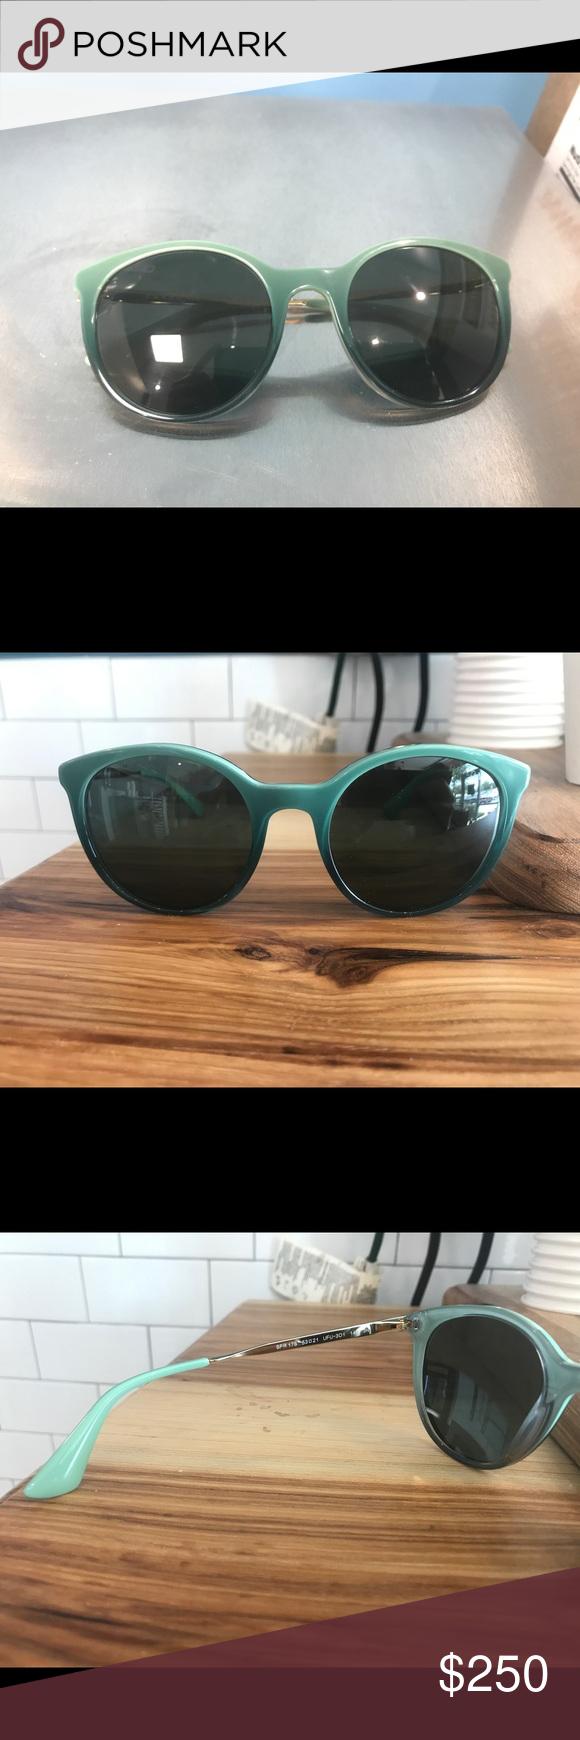 fc1ff06027f Shop Women s Prada Blue Green size OS Sunglasses at a discounted price at  Poshmark. Description  Prada blue gold and green cinema sunglasses.